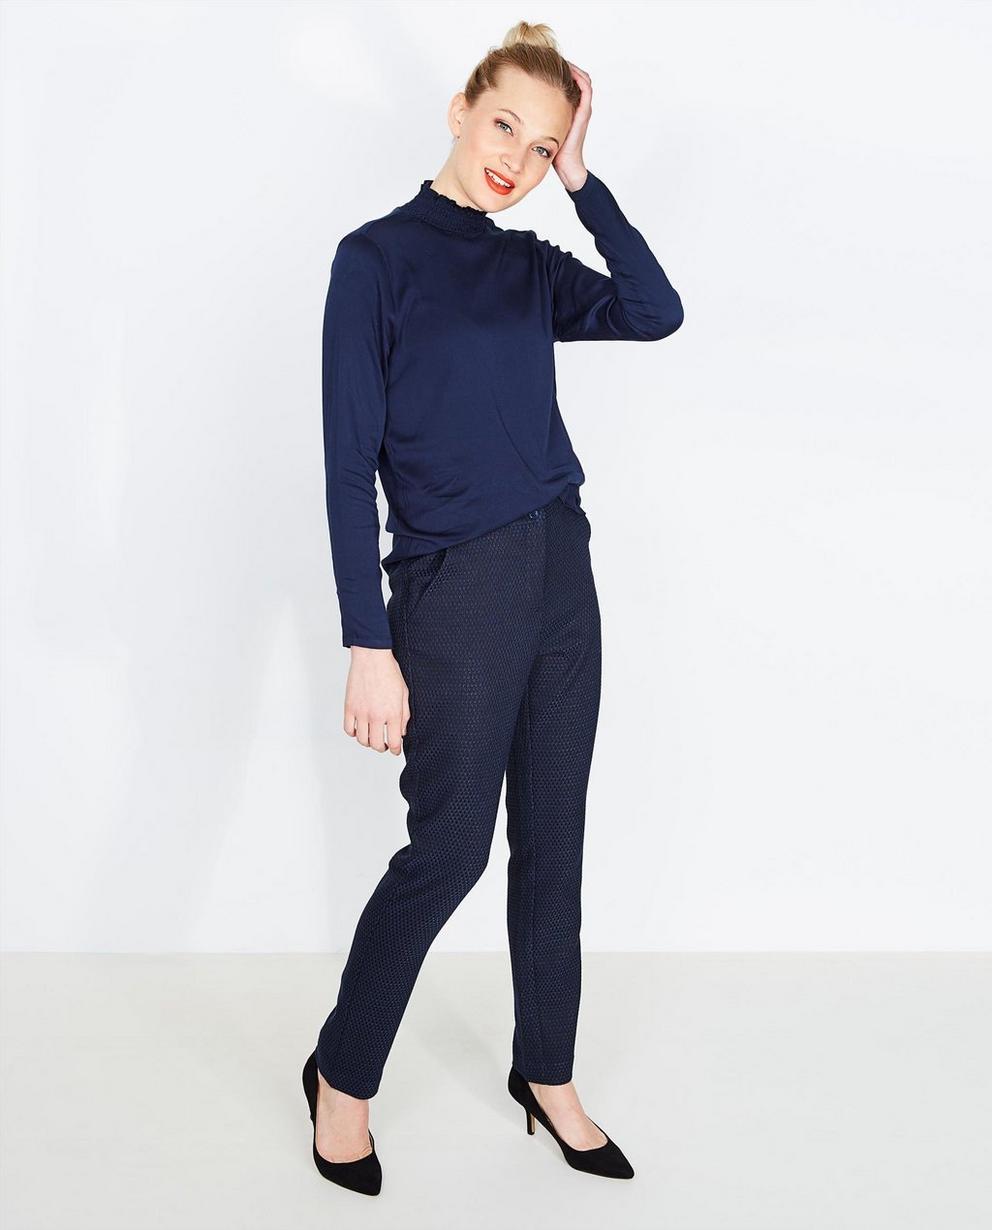 Pantalon avec un relief - bleu, Soaked in Luxury - Soaked in Luxury